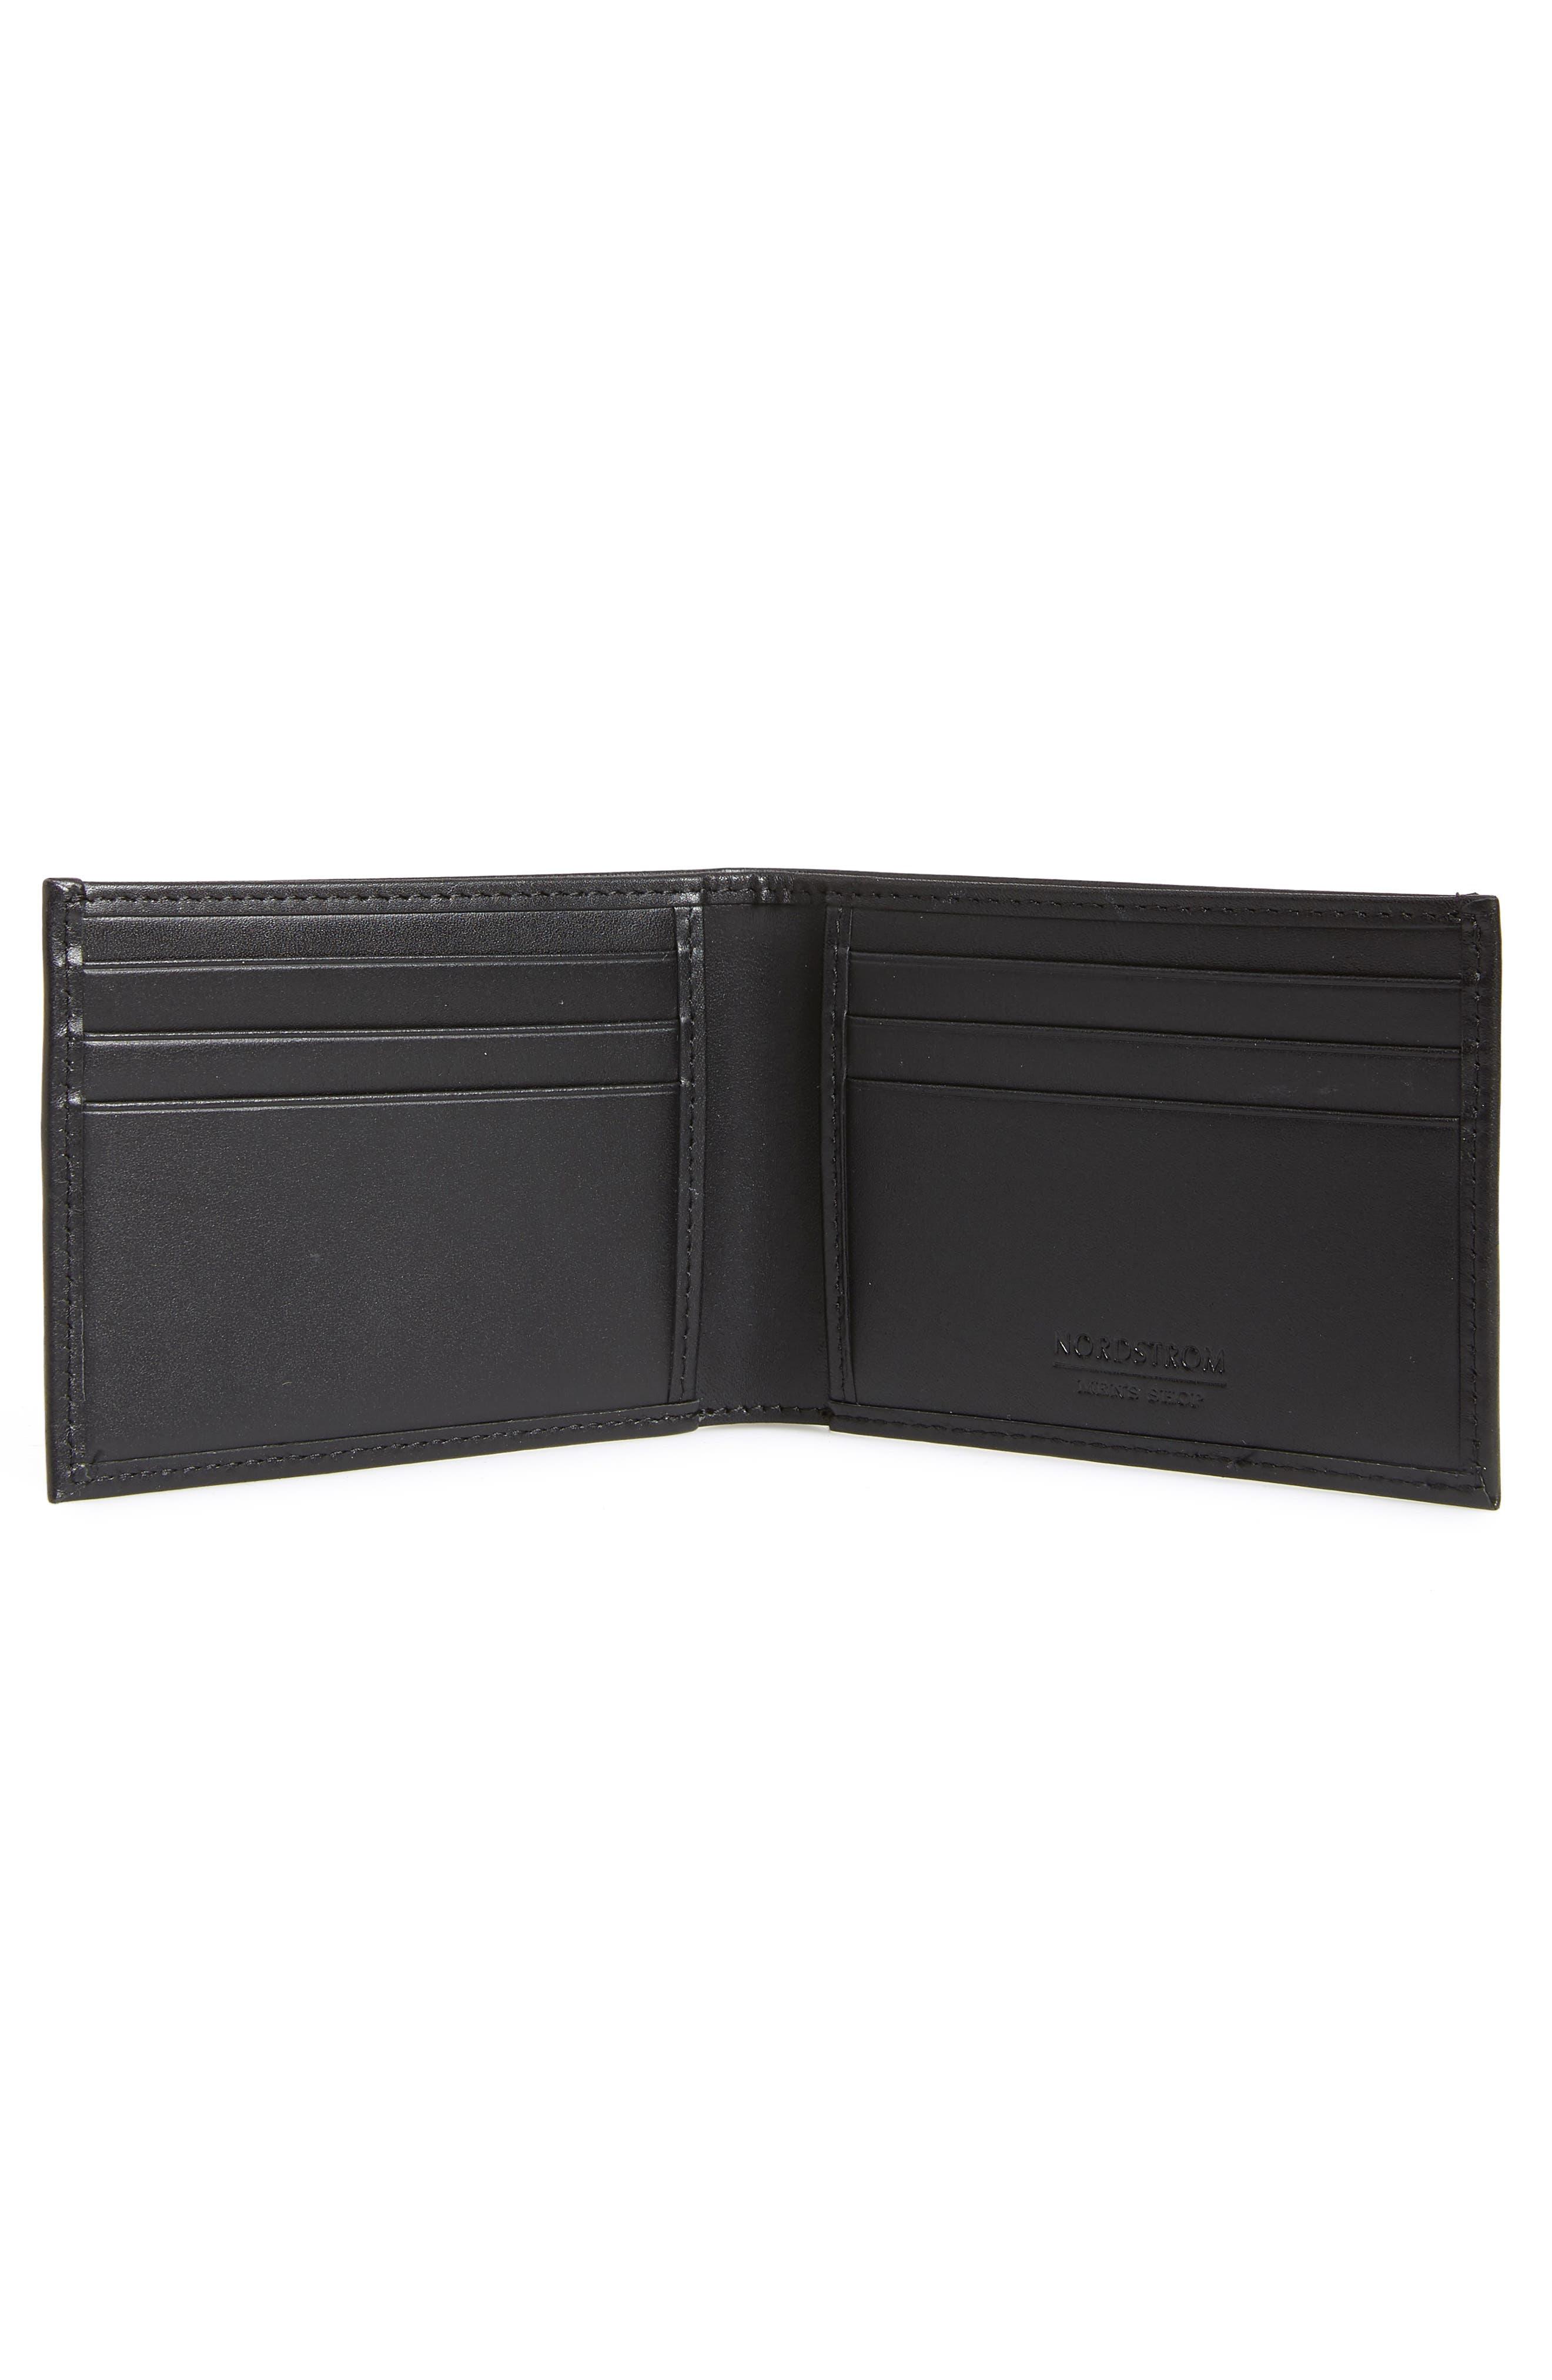 Chelsea Leather Wallet,                             Alternate thumbnail 2, color,                             BLACK